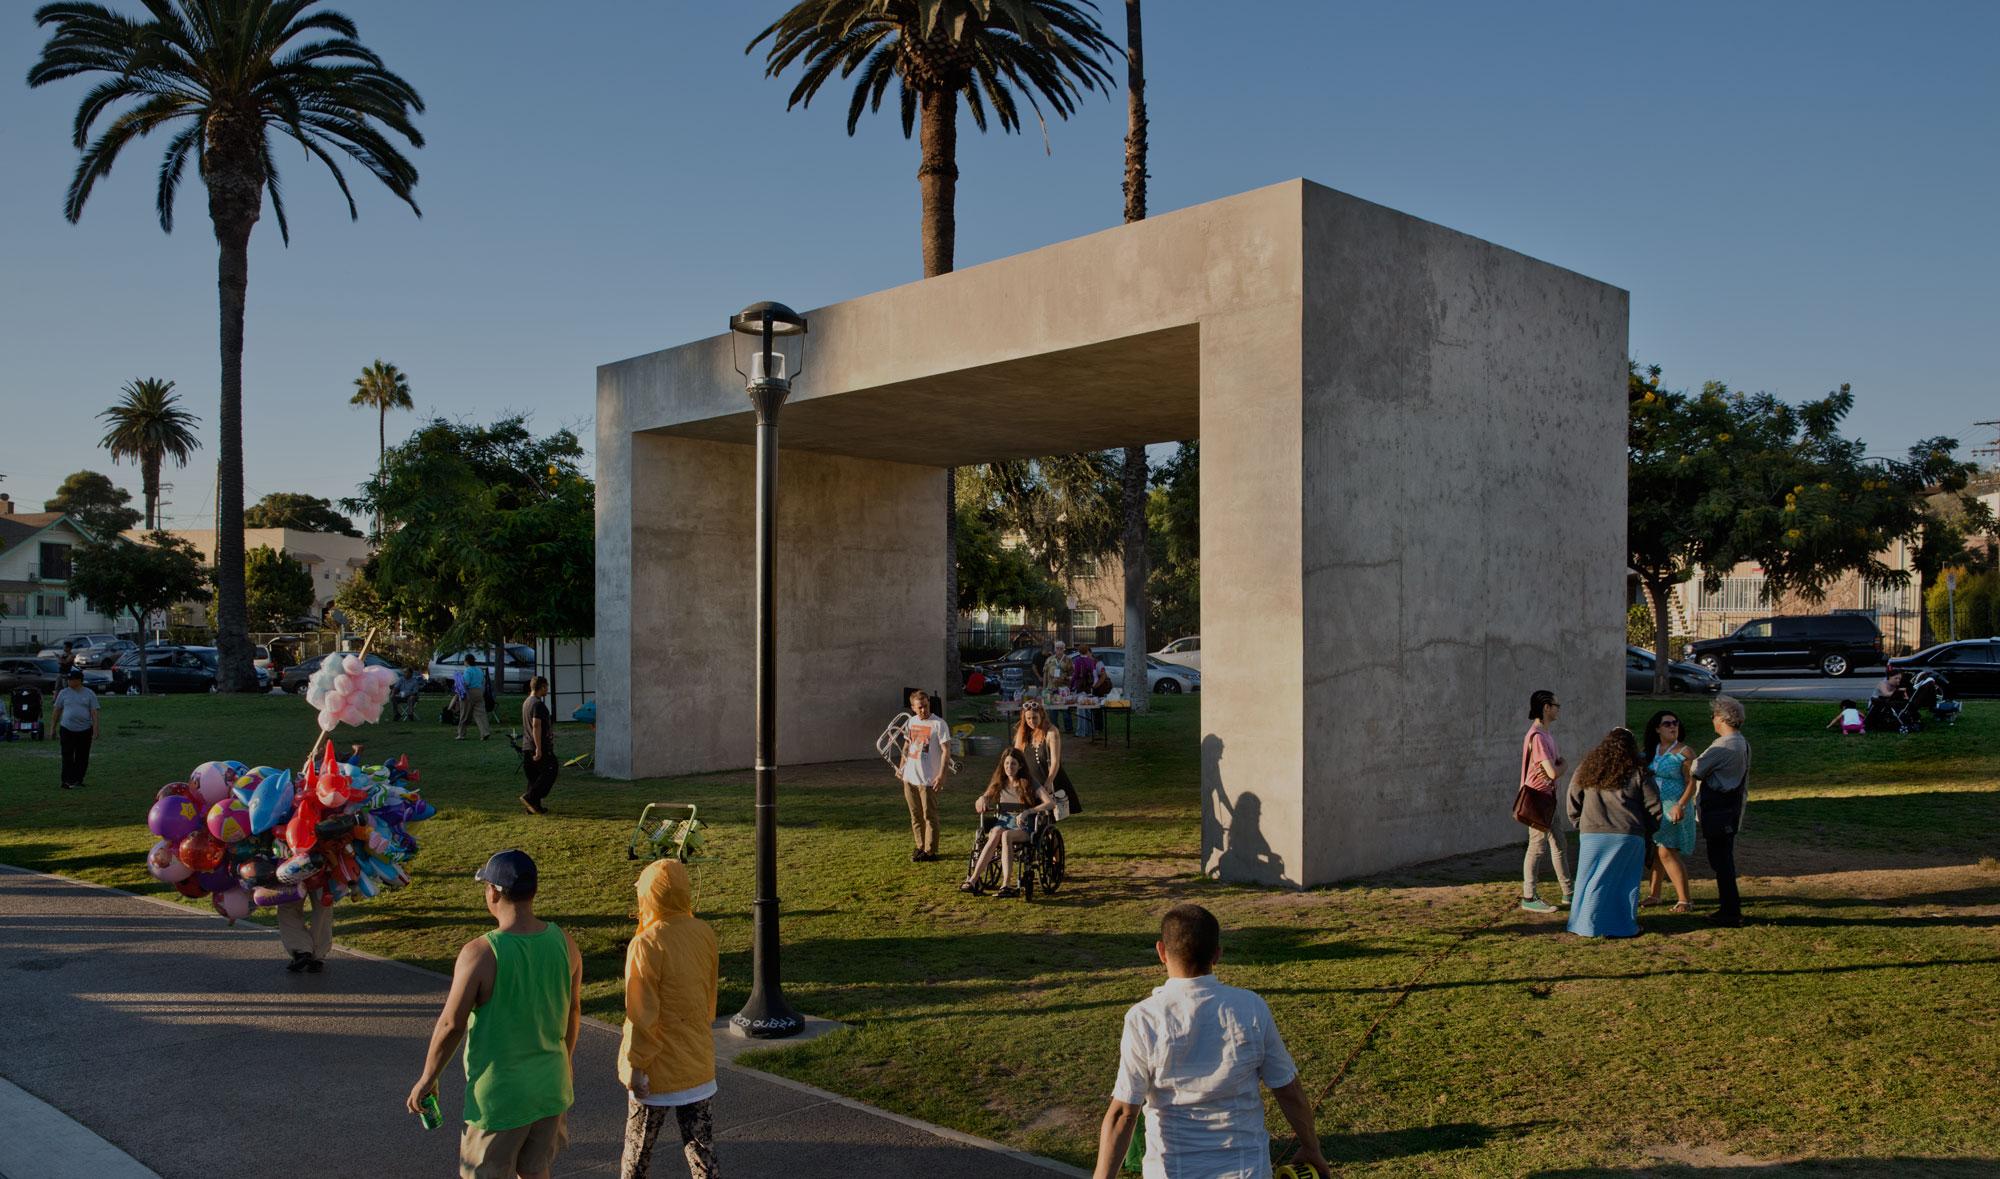 Bloomberg Philanthropies Announces Public Art Challenge